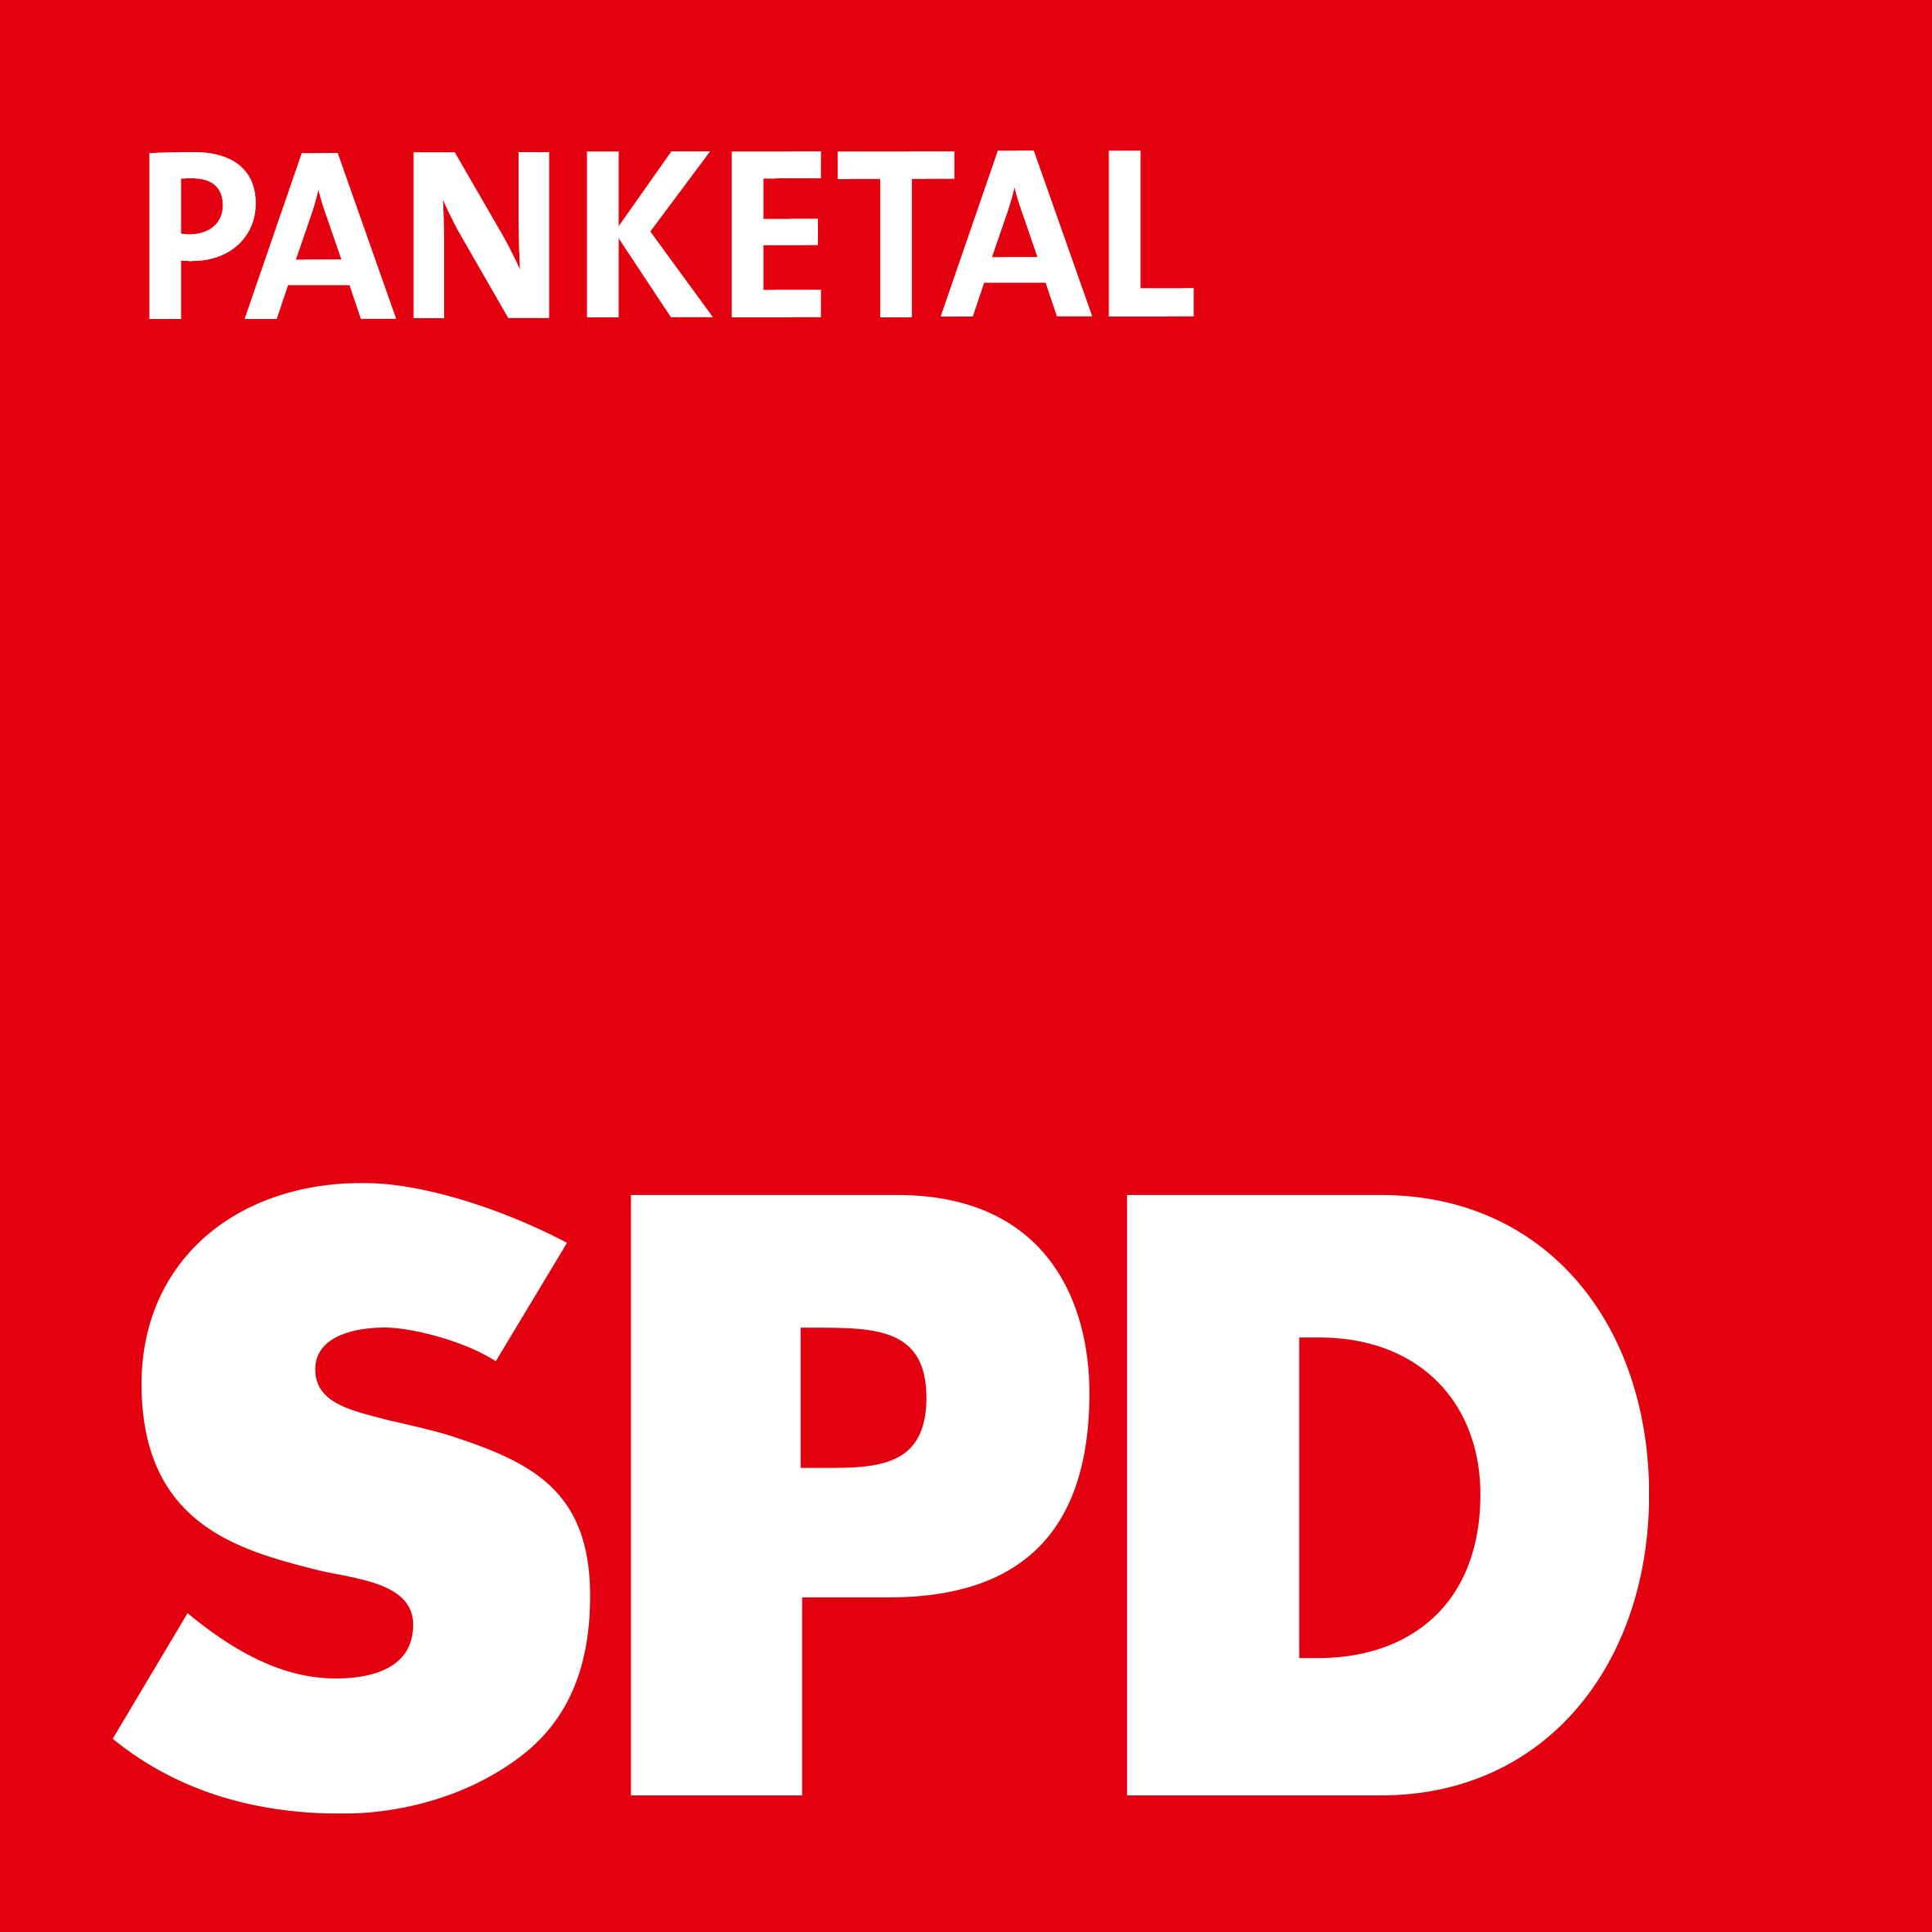 SPD Panketal